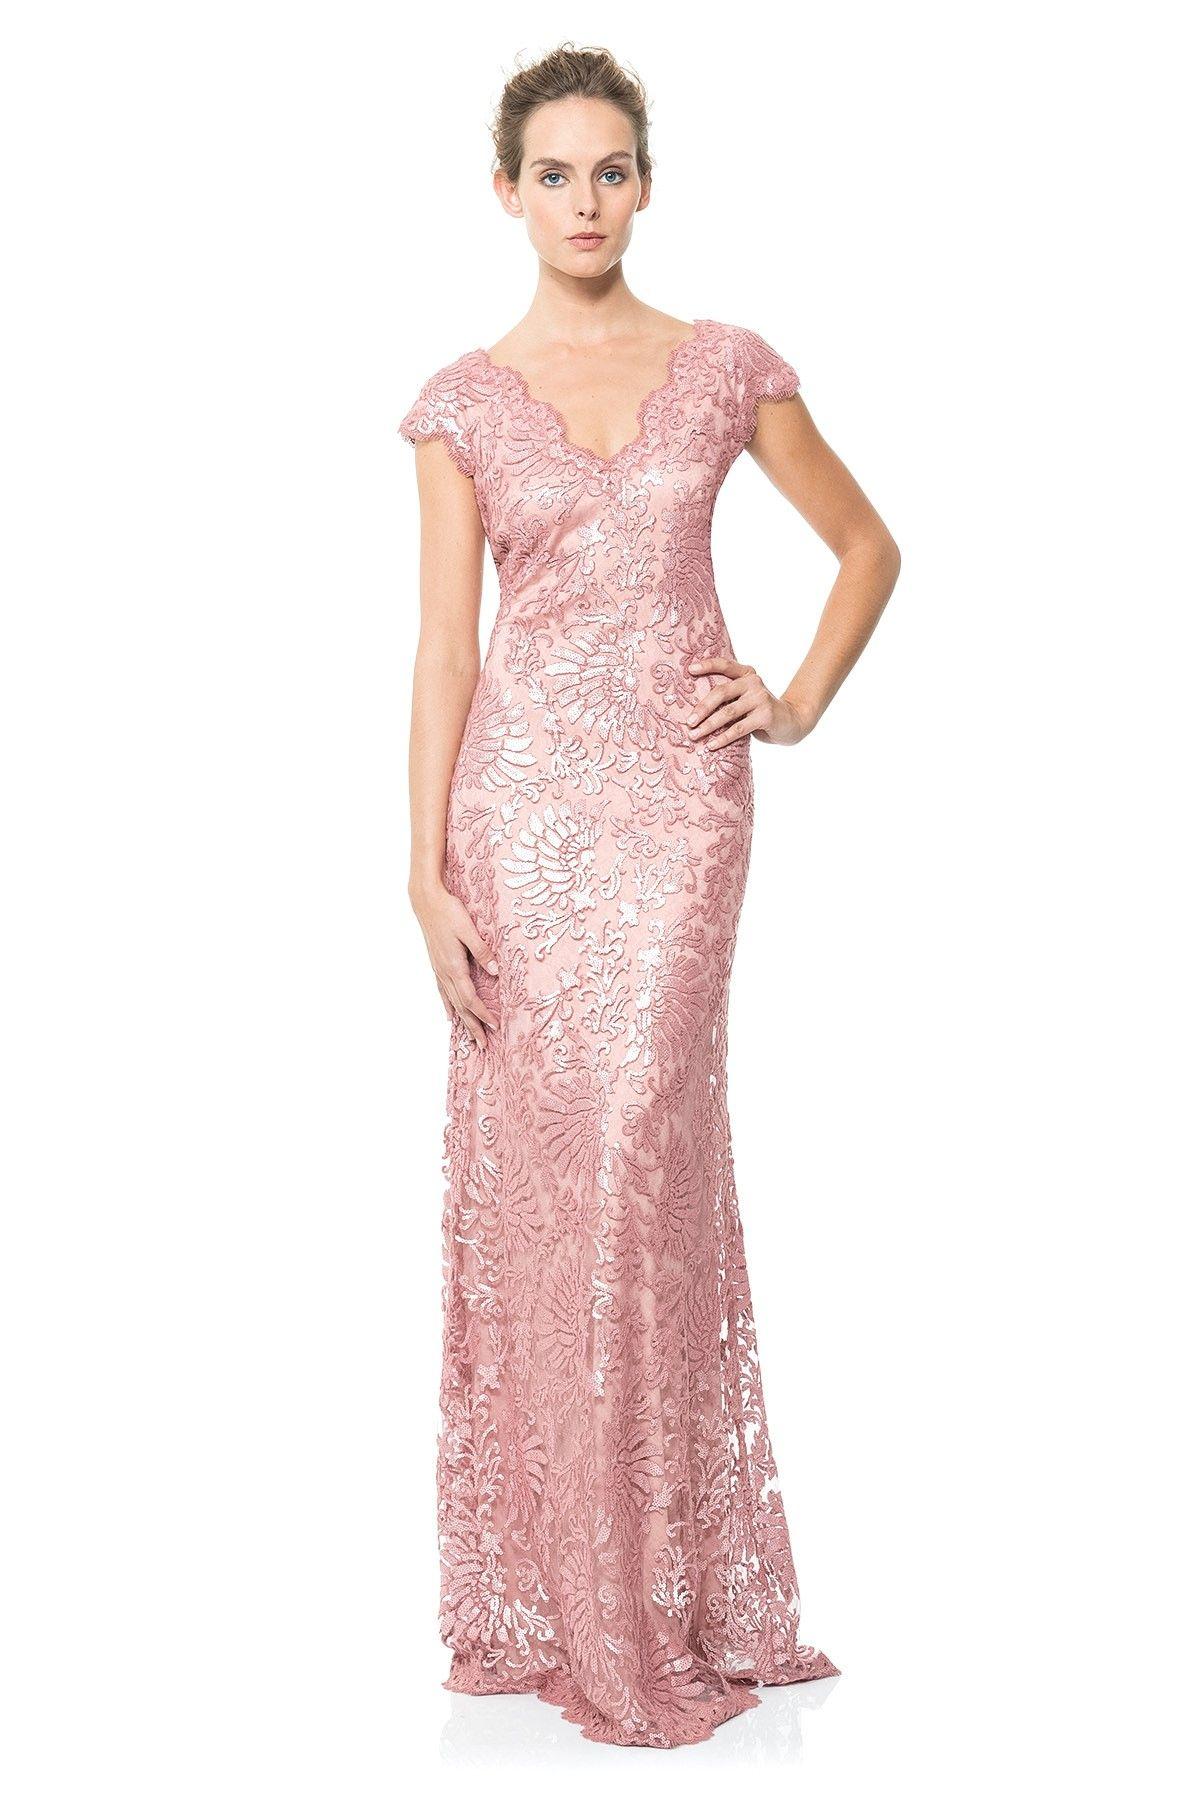 Paillette Embroidered Lace V-Neck Gown | Tadashi Shoji | Dresses ...